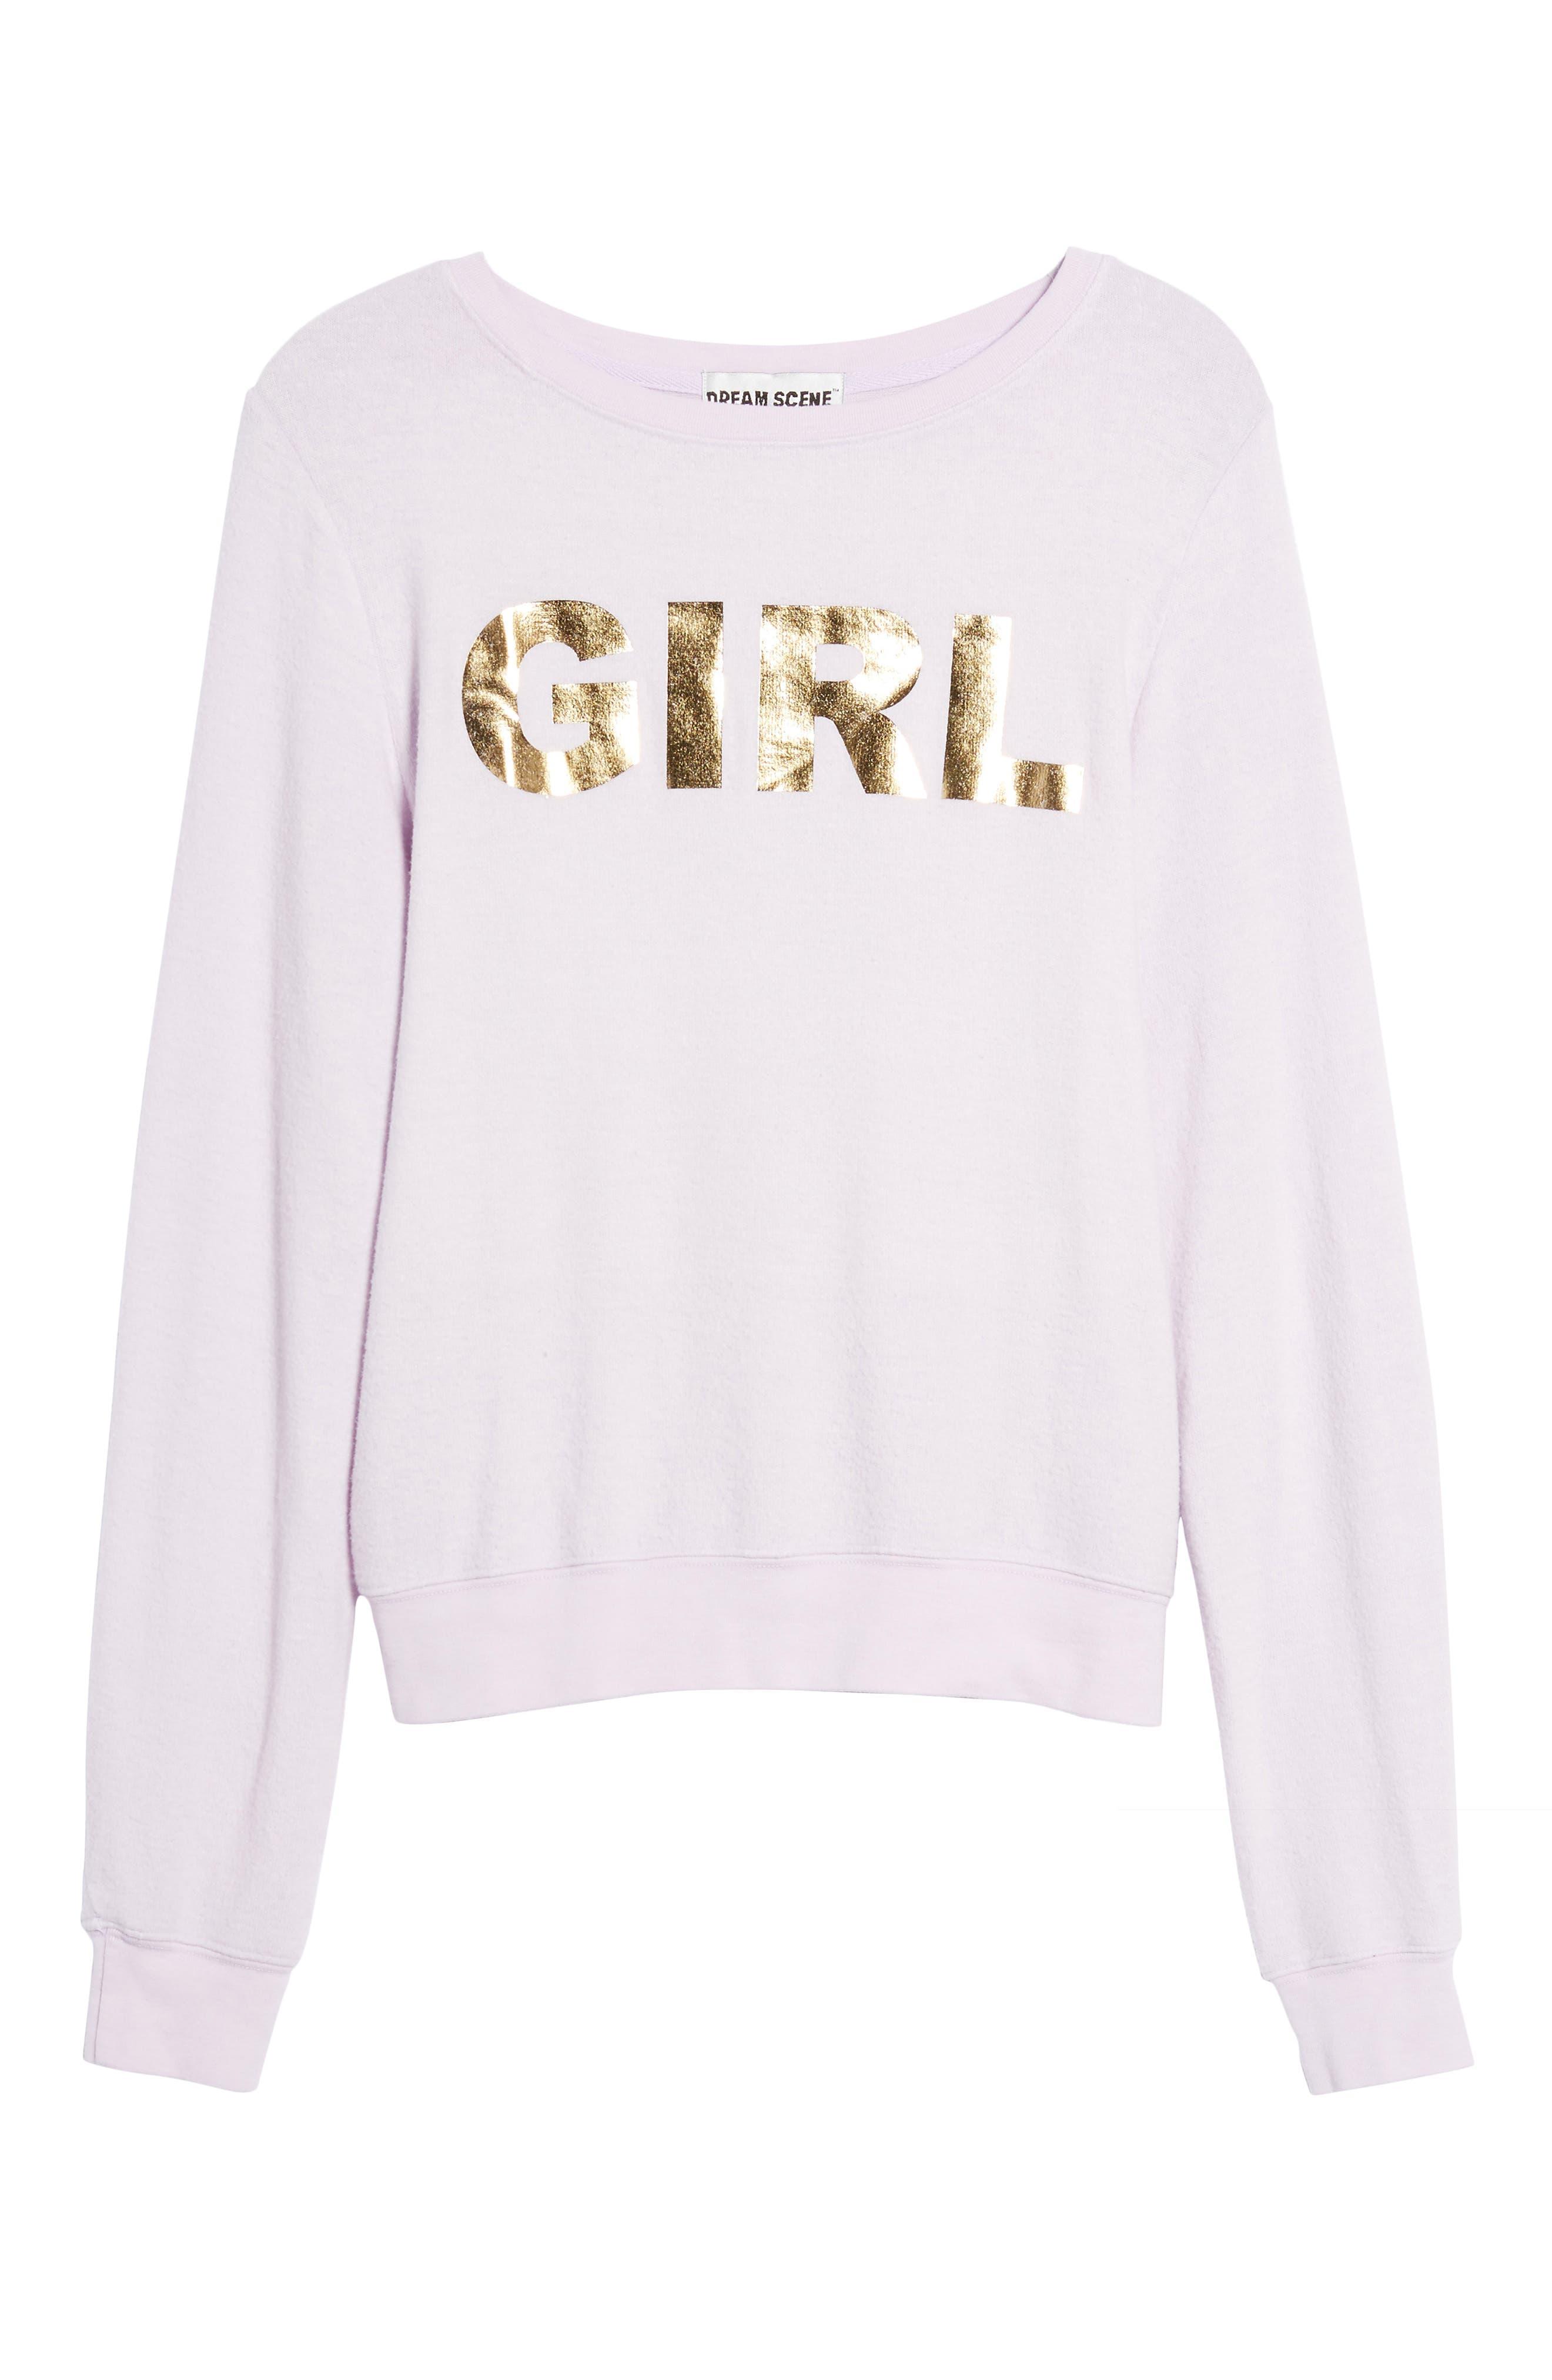 Girl Sweatshirt,                             Alternate thumbnail 6, color,                             510